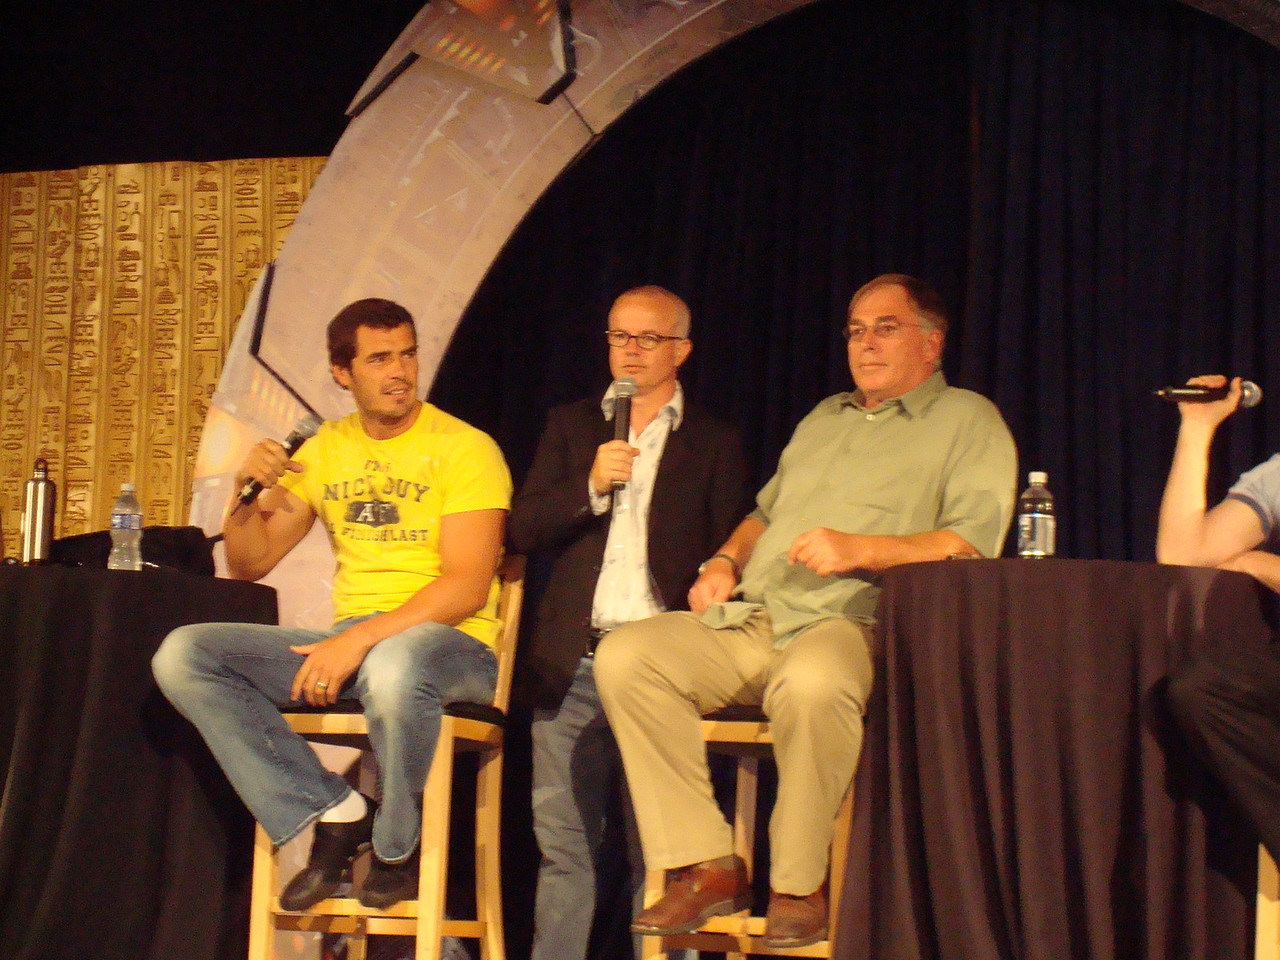 Dan Payne (Super Soldier, Wraith Warrior), Gary Jones (Sgt. Walter Davis/Harriman), Gary Chalk (Colonel Chekhov)